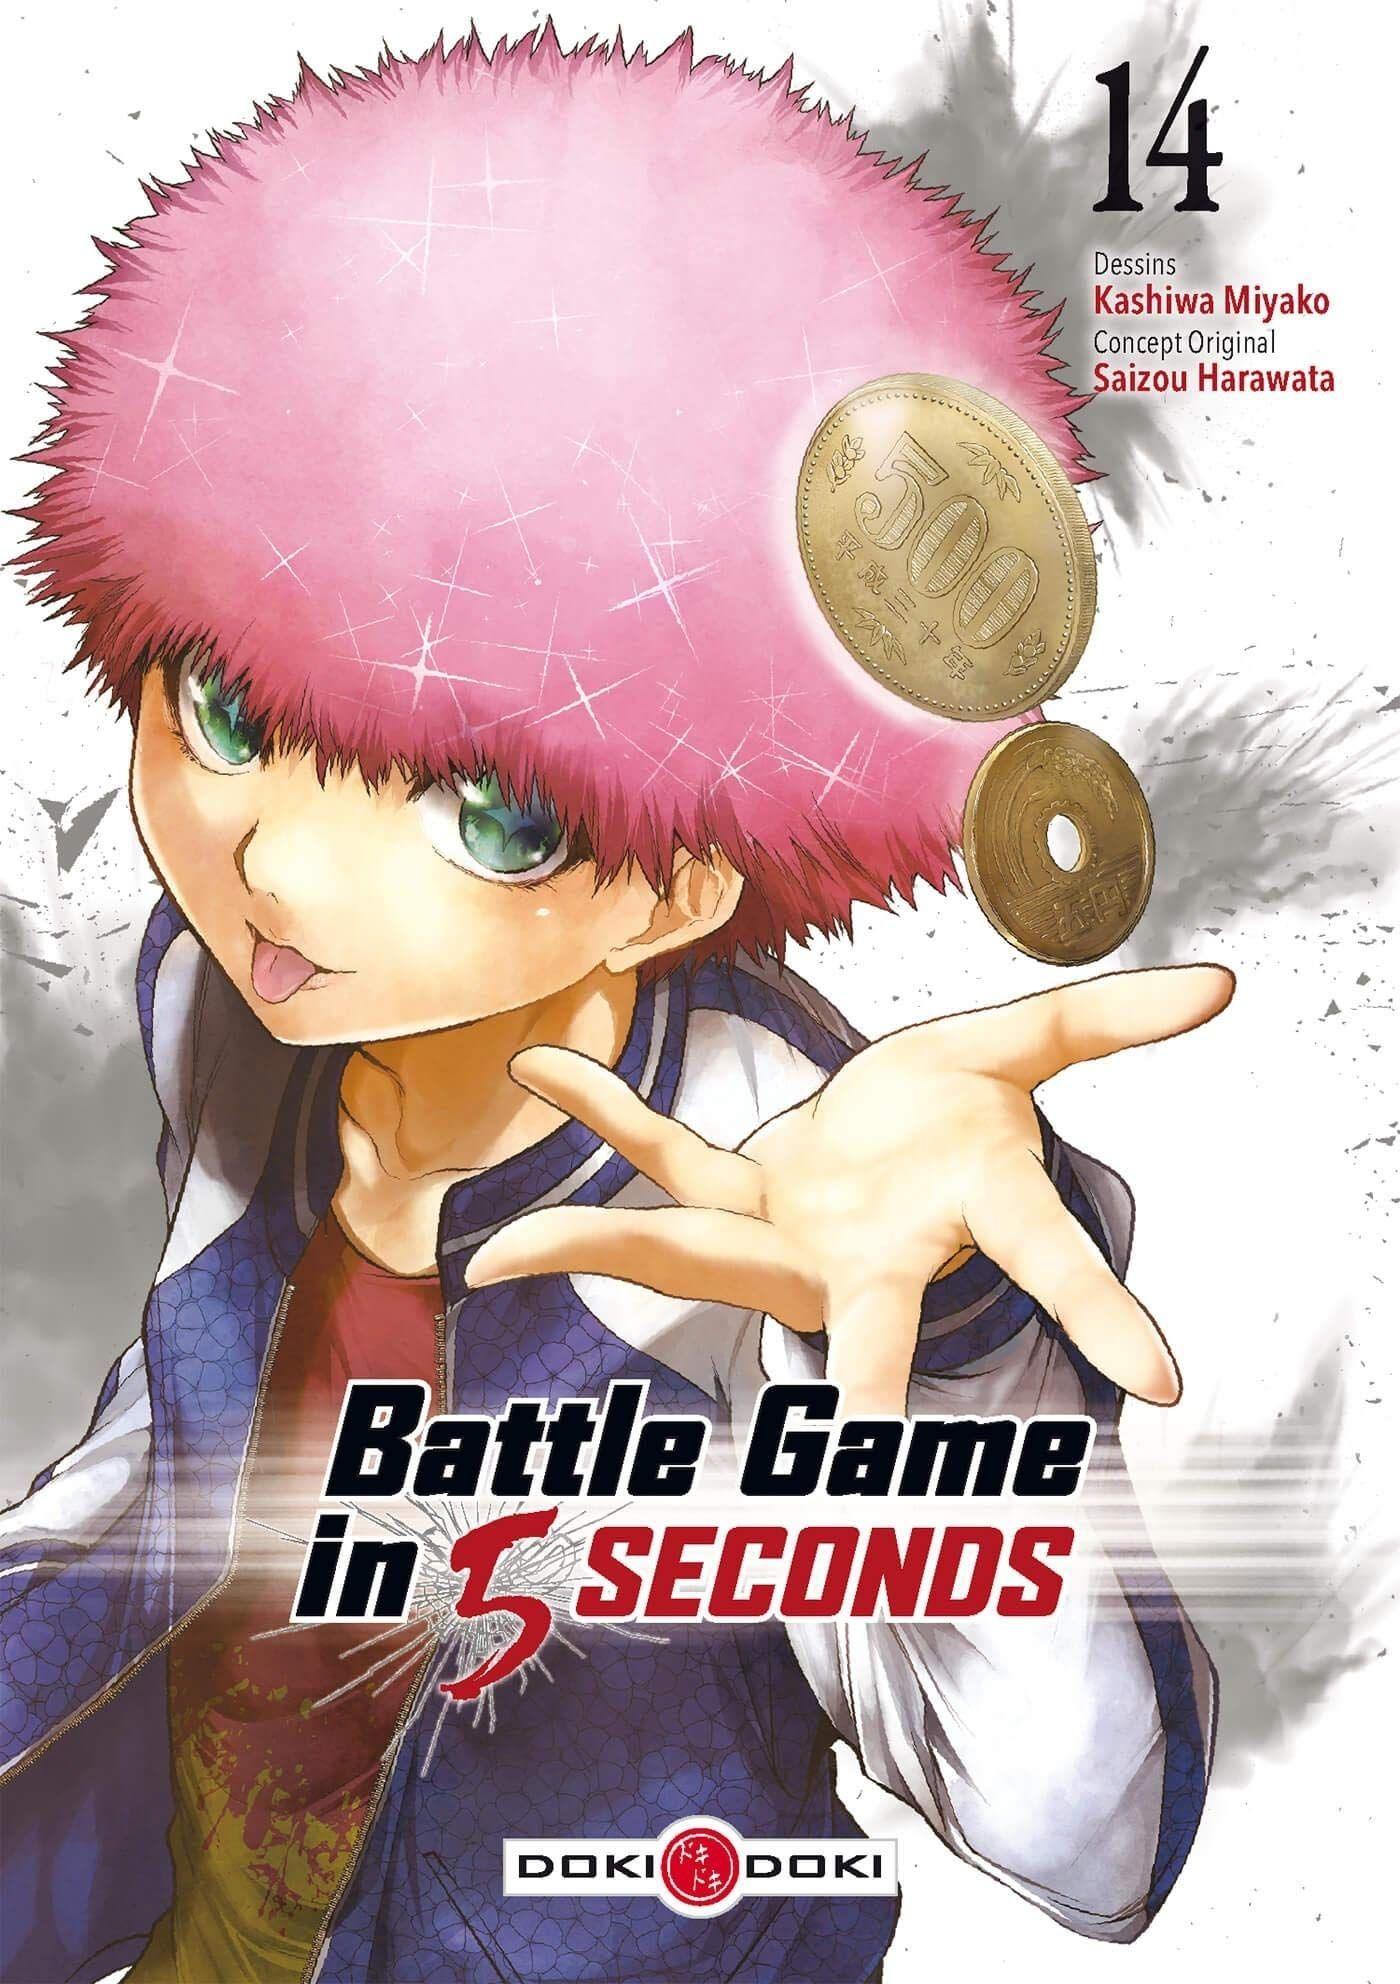 Sortie Manga au Québec JUIN 2021 Battle_game_5seconds_14_doki